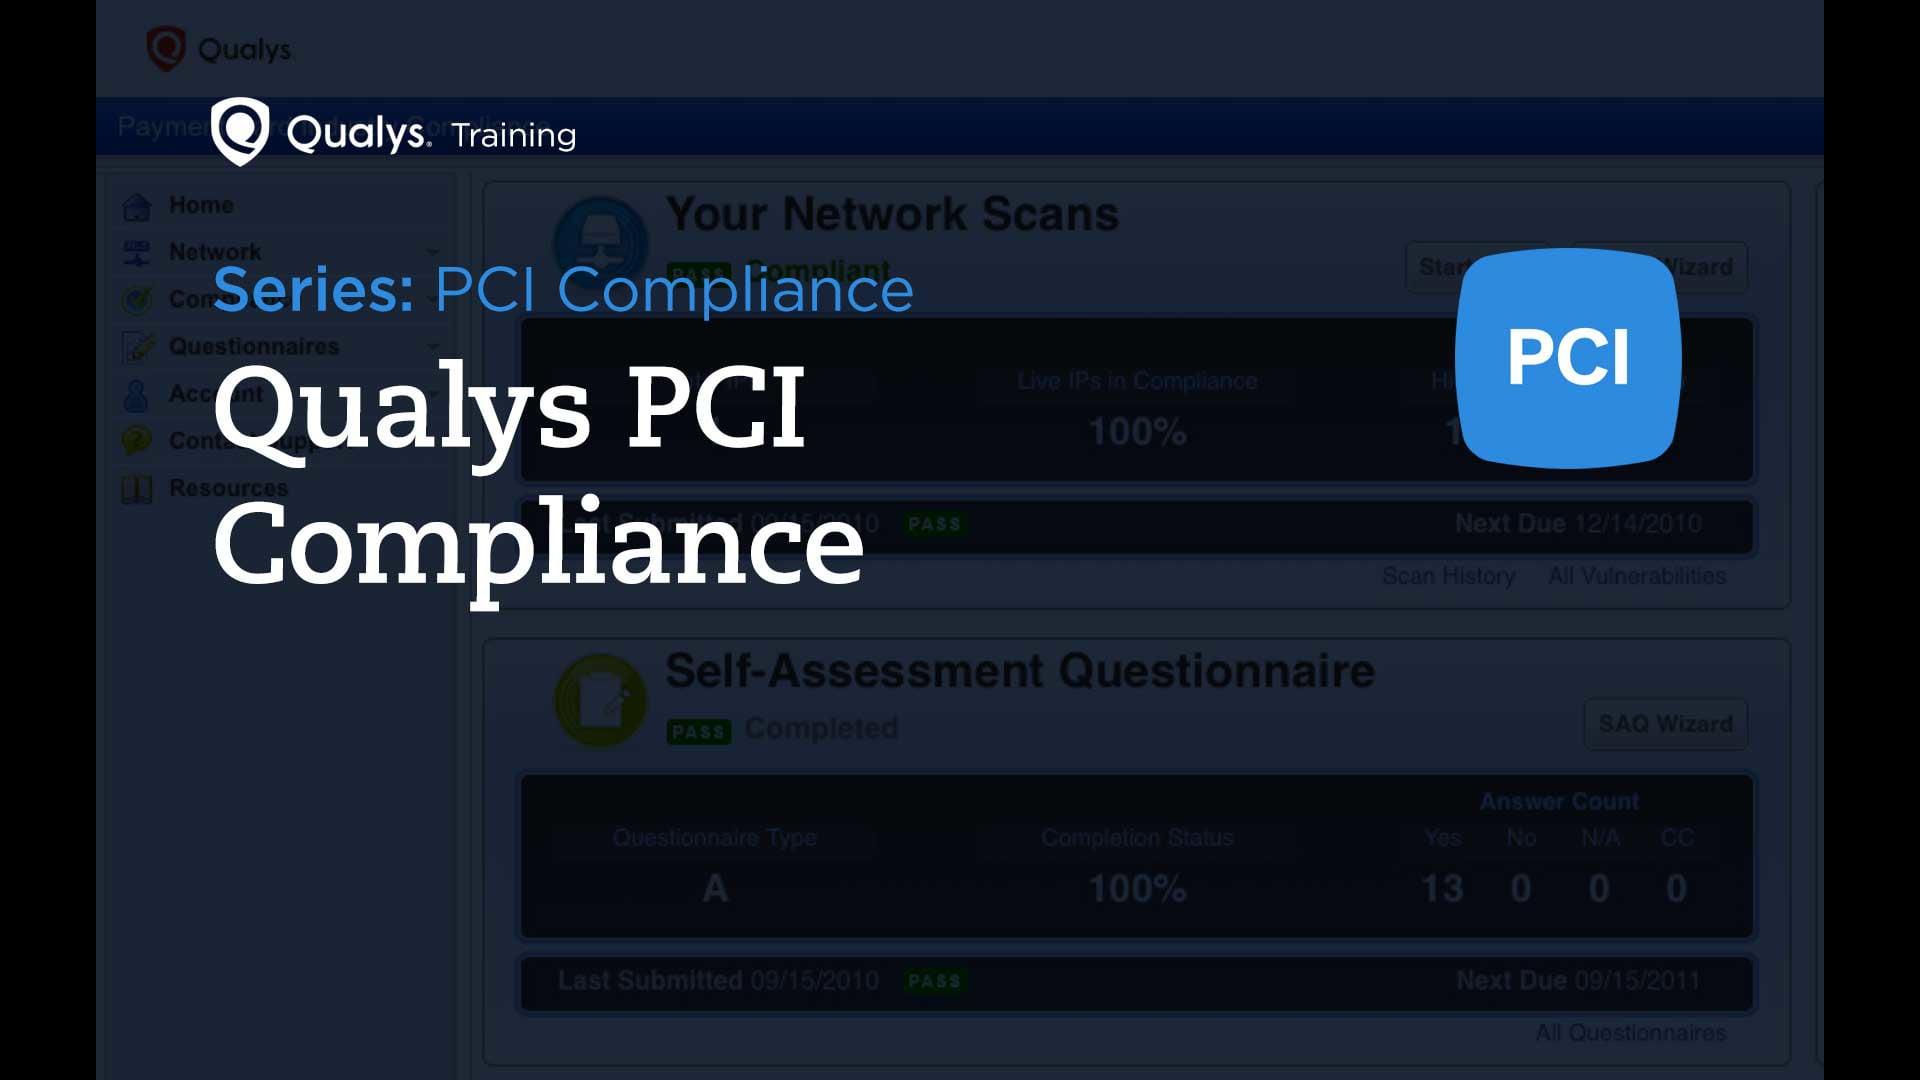 Qualys PCI Compliance